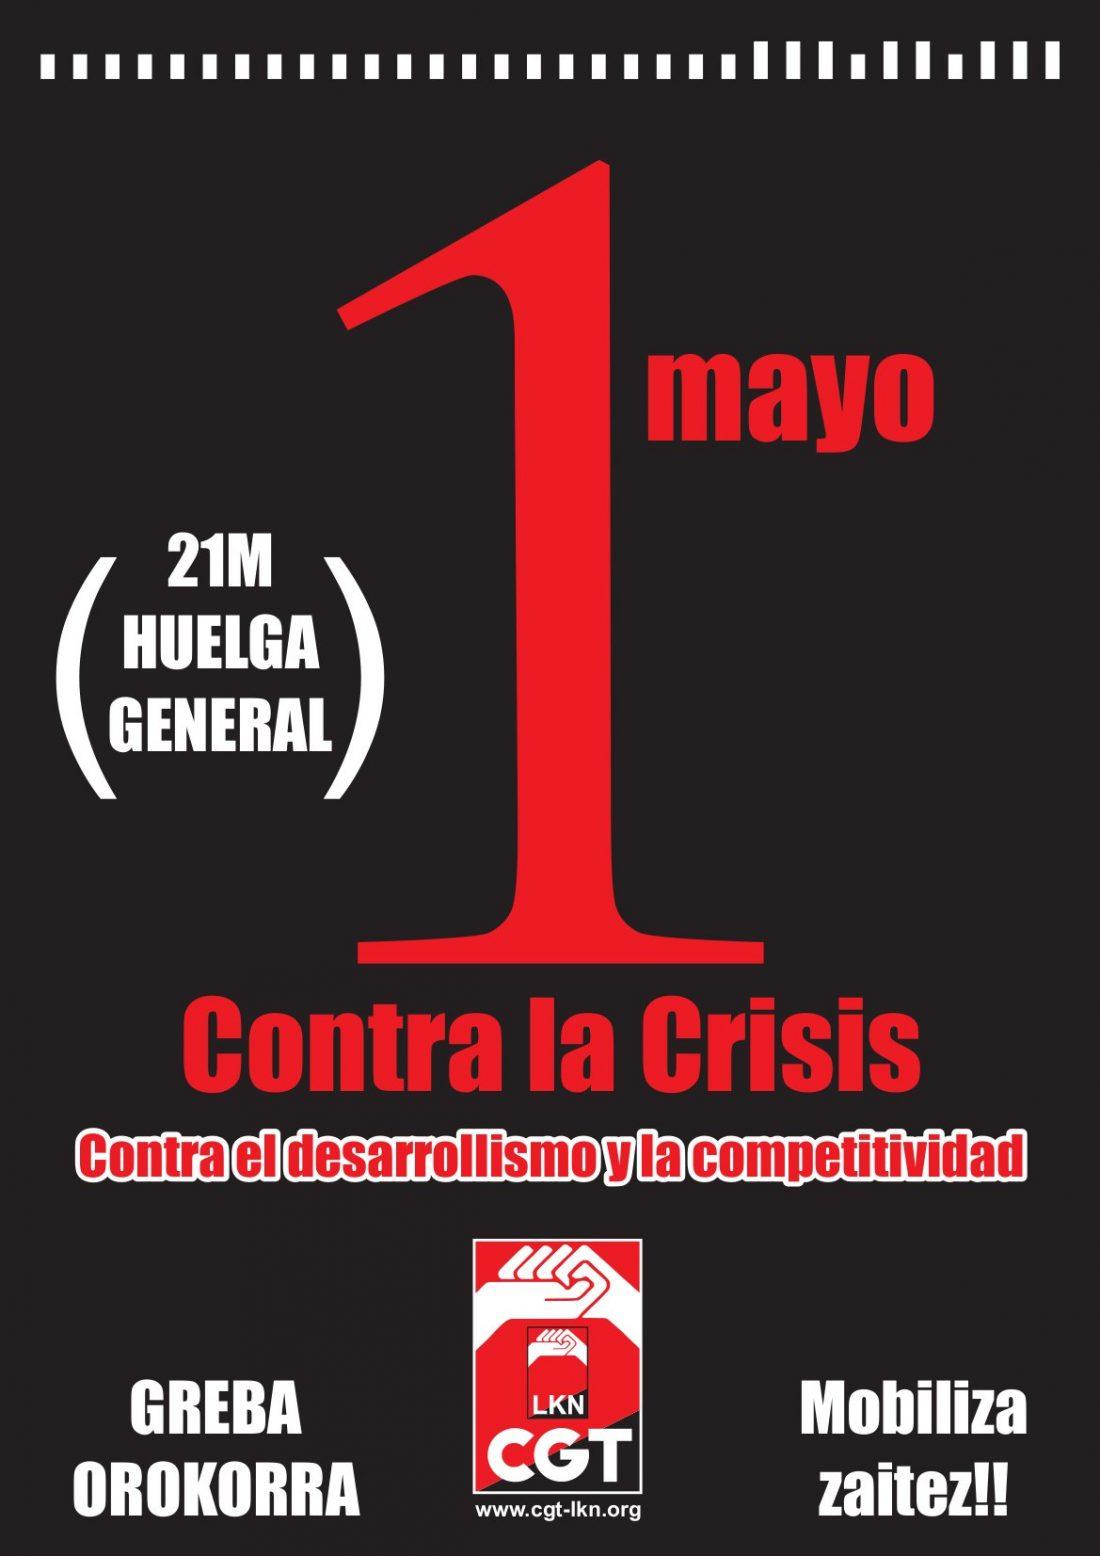 21 de Mayo: Huelga General en Nafarroa